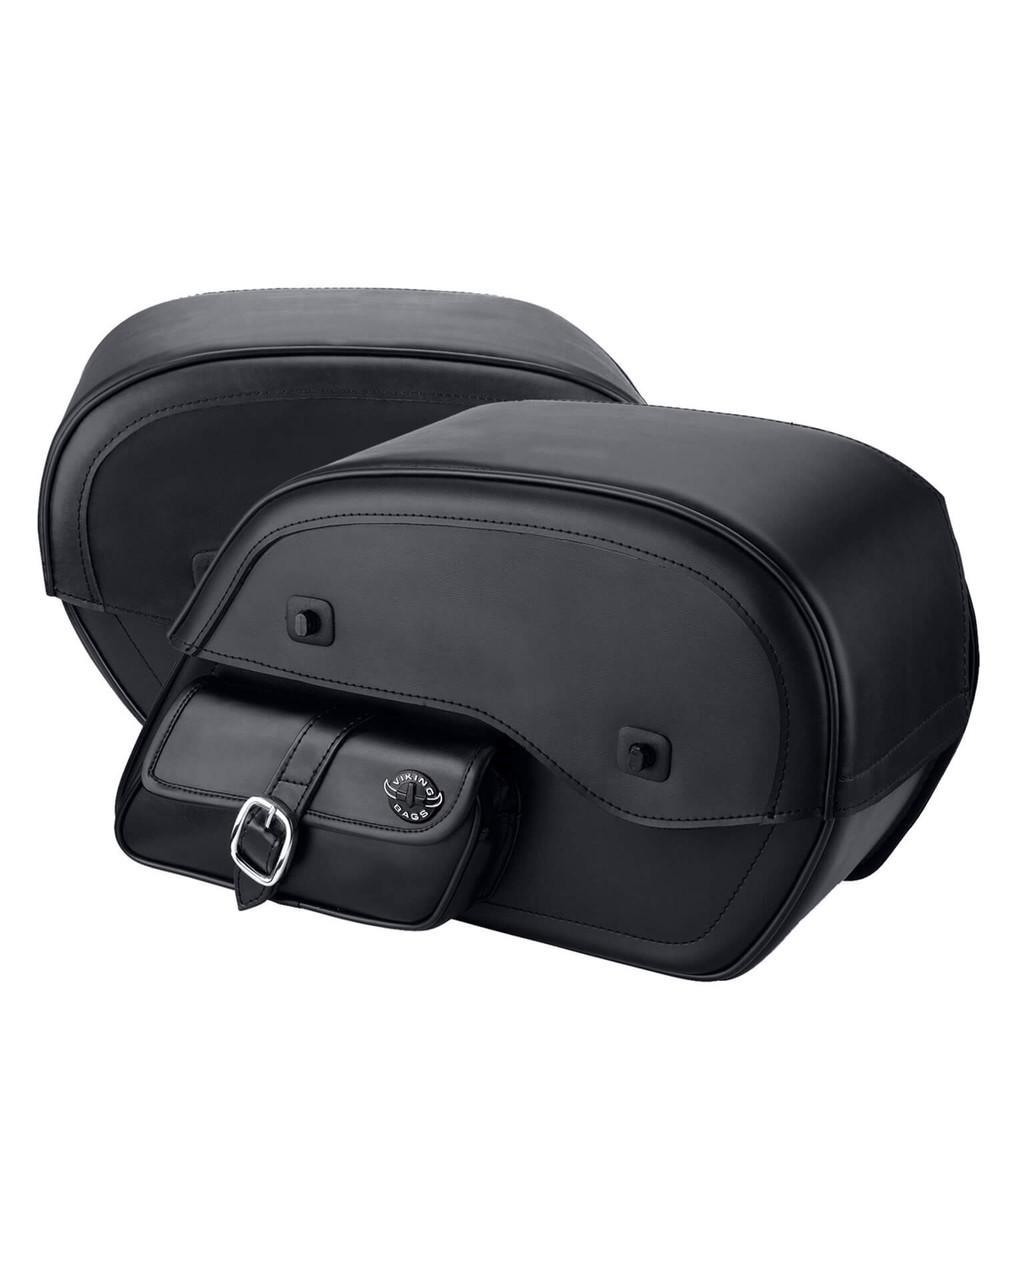 Suzuki Intruder 1500 VL1500 SS Side Pocket Motorcycle Saddlebags Both Bags View